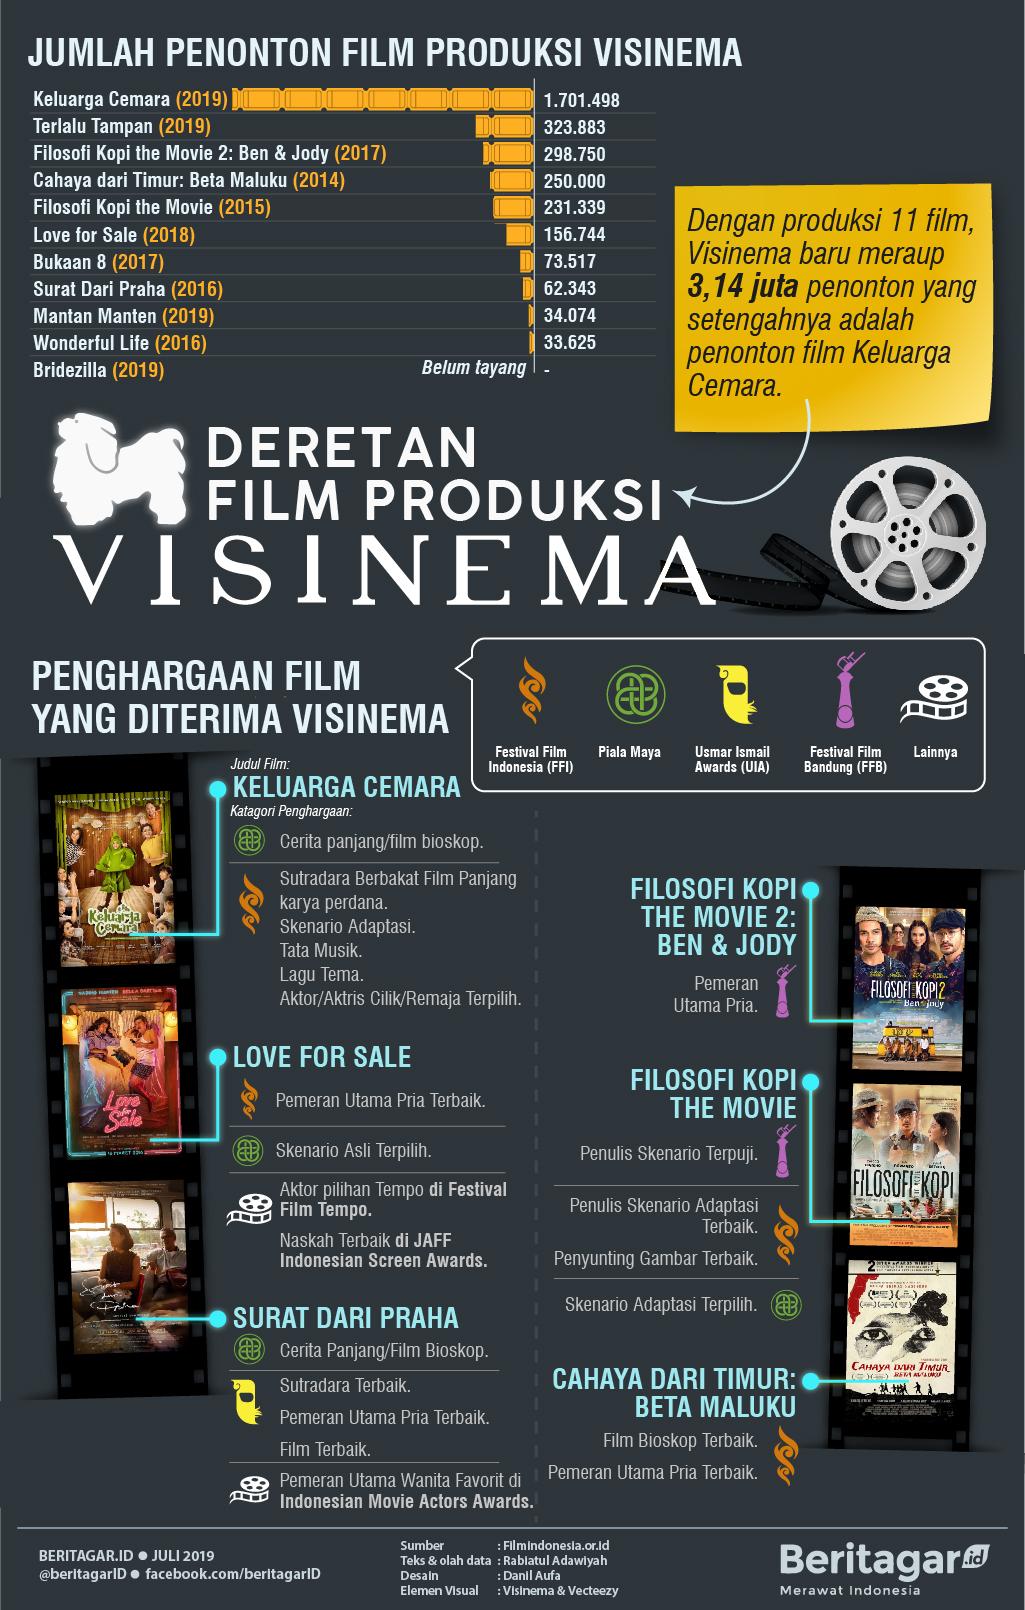 Infografis Deretan Film Produksi Visinema